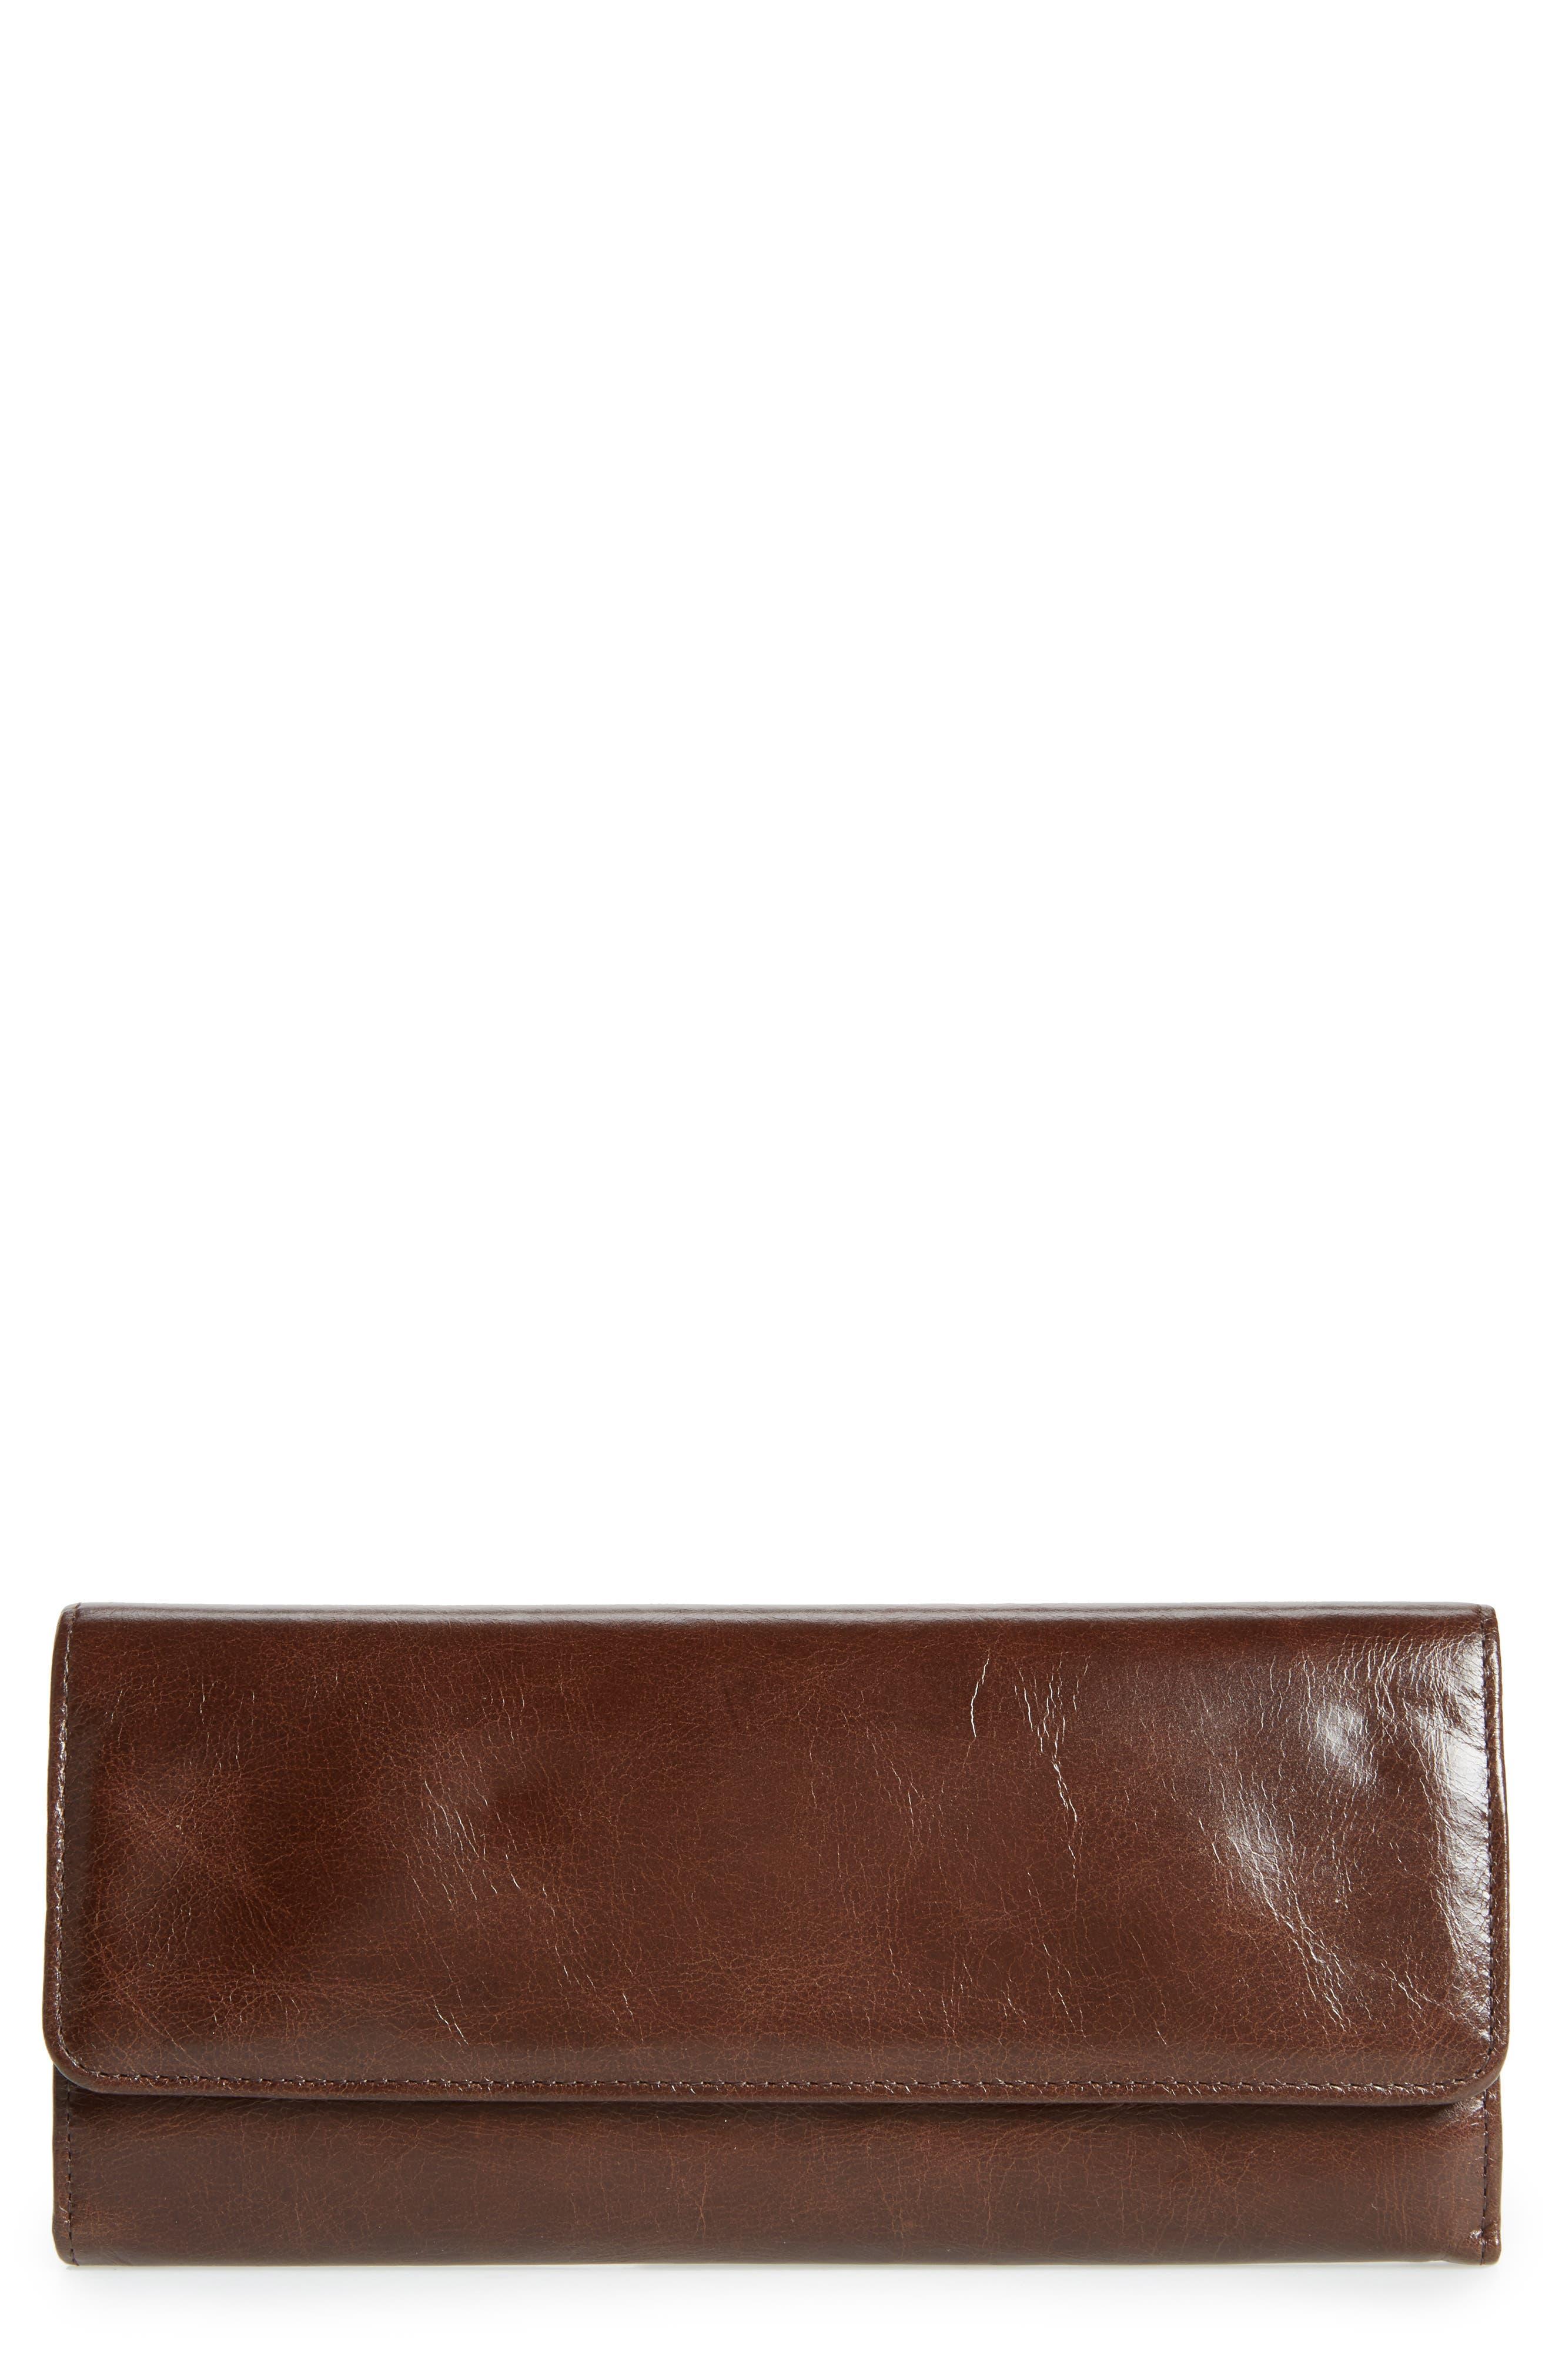 'Sadie' Leather Wallet,                             Main thumbnail 3, color,